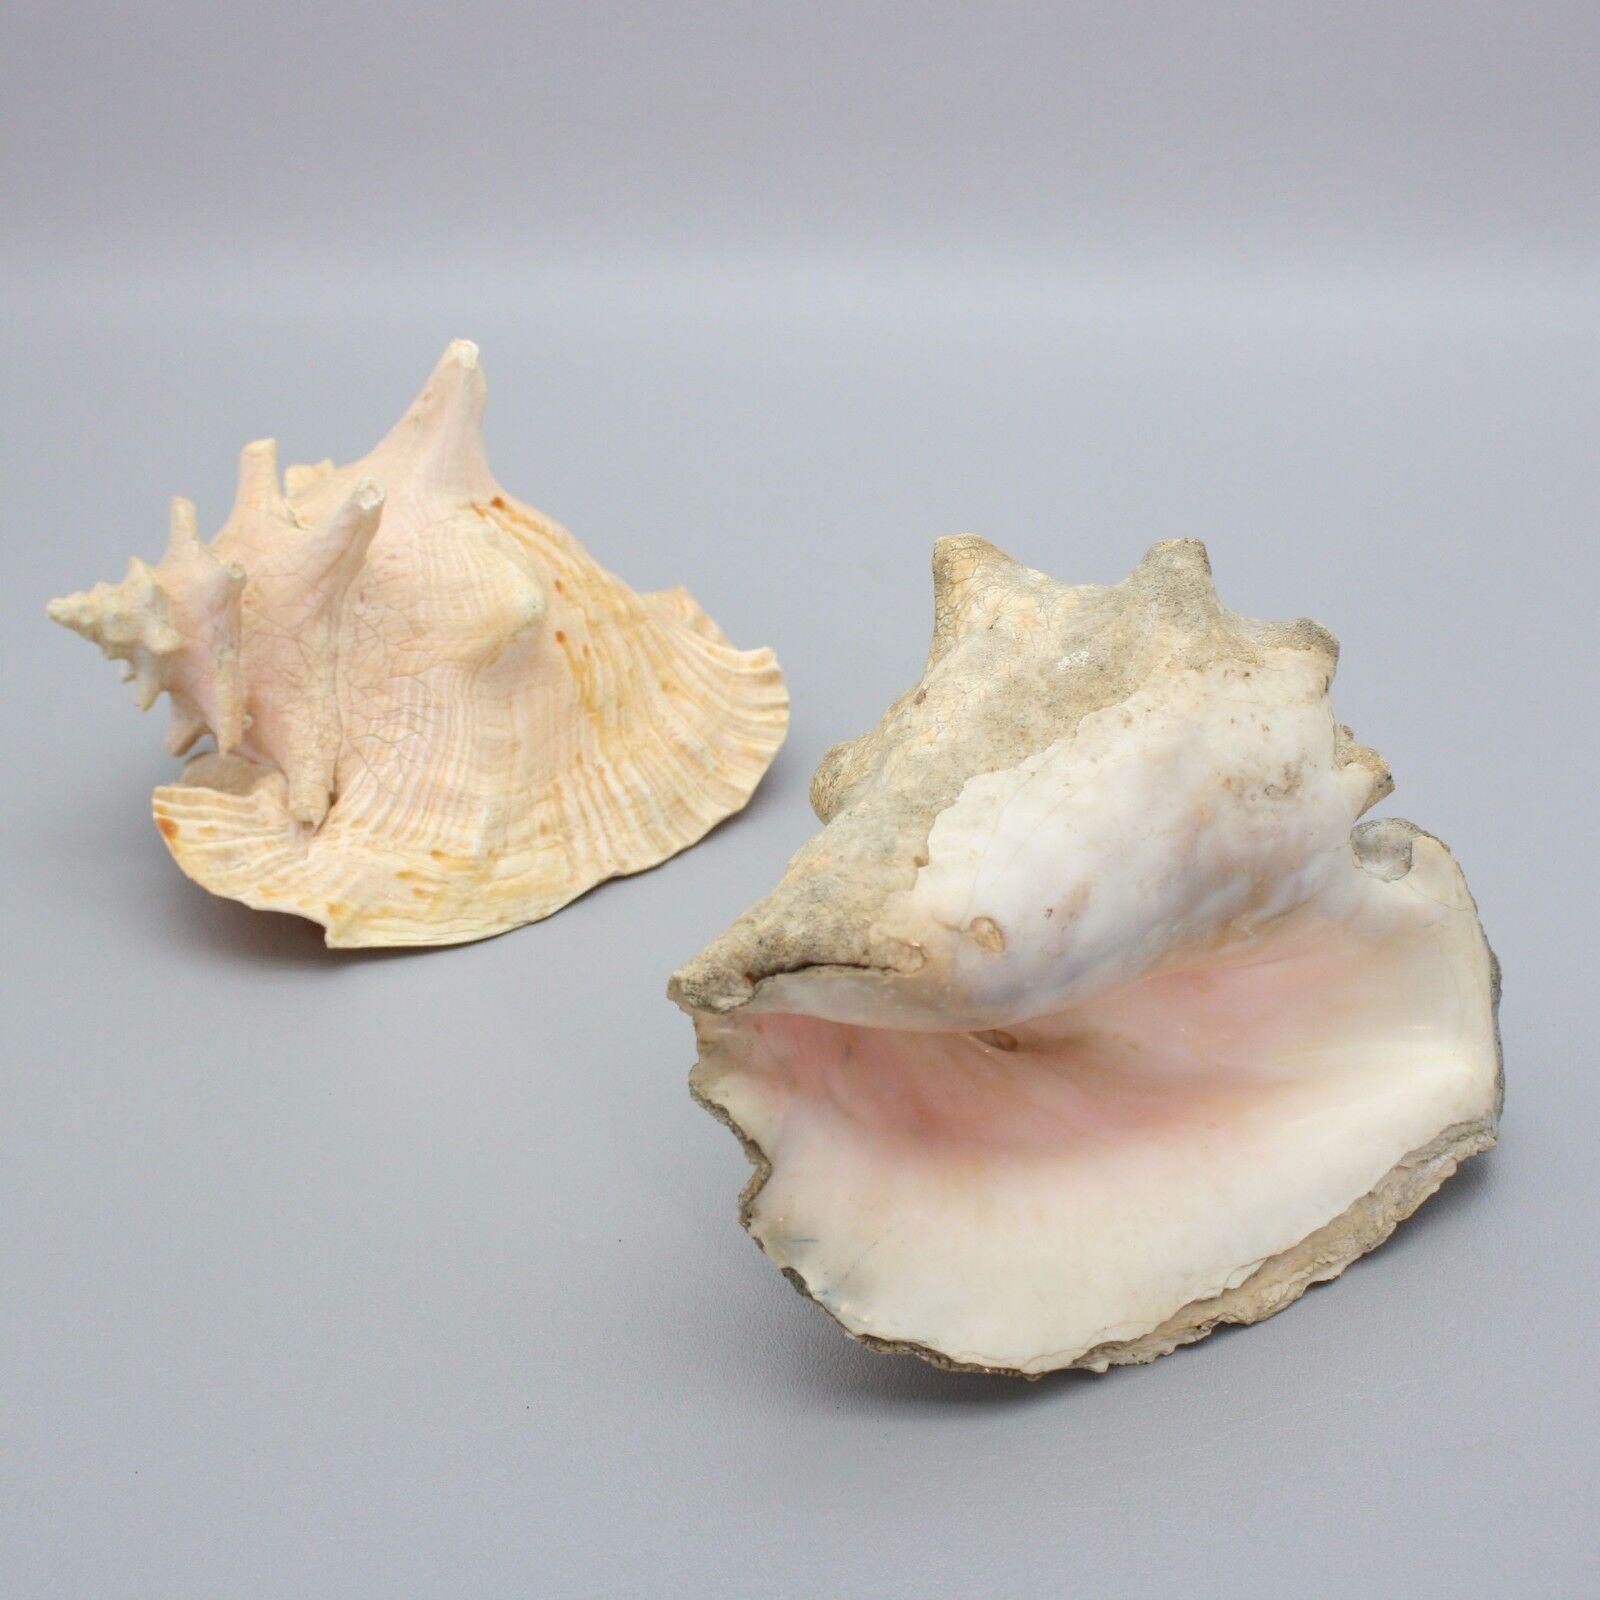 PC Shells 8 OZ Apprx.60 3//4 Inch ~ 1-1//4 Inch PEPPERLONELY White Natica Snail Sea Shells